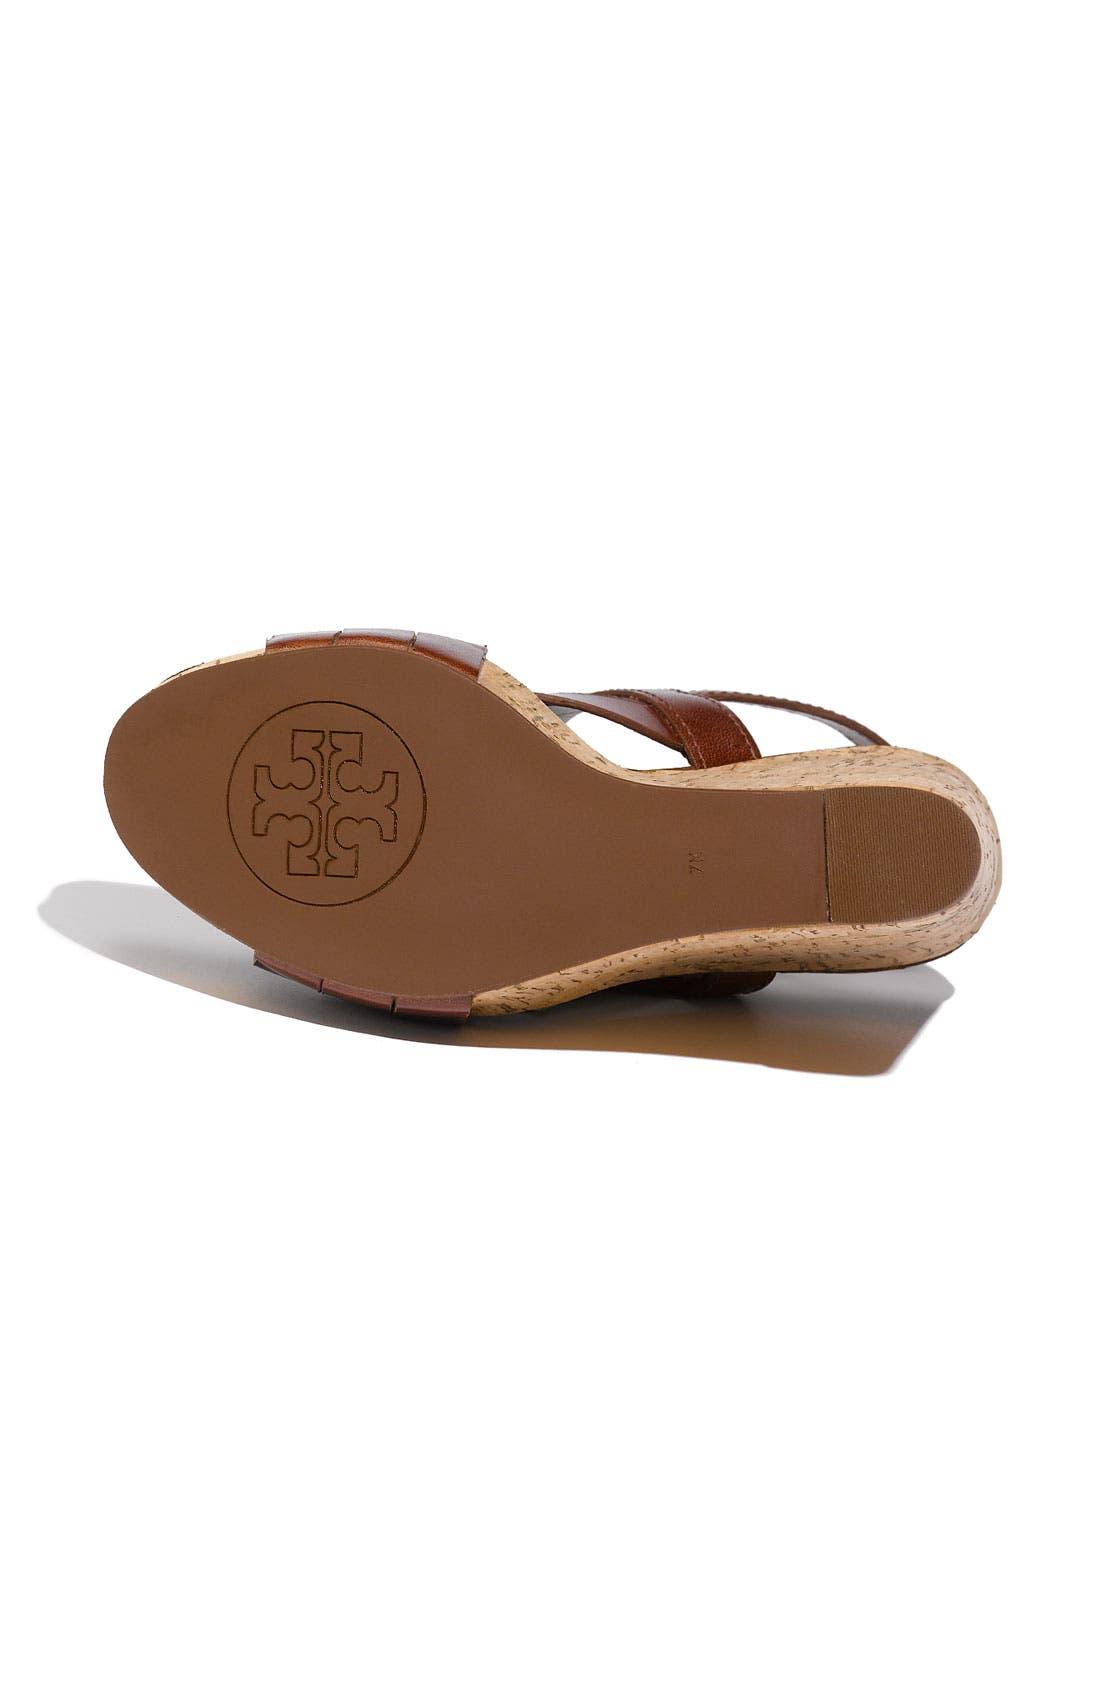 Alternate Image 4  - Tory Burch 'Ace' Wedge Sandal